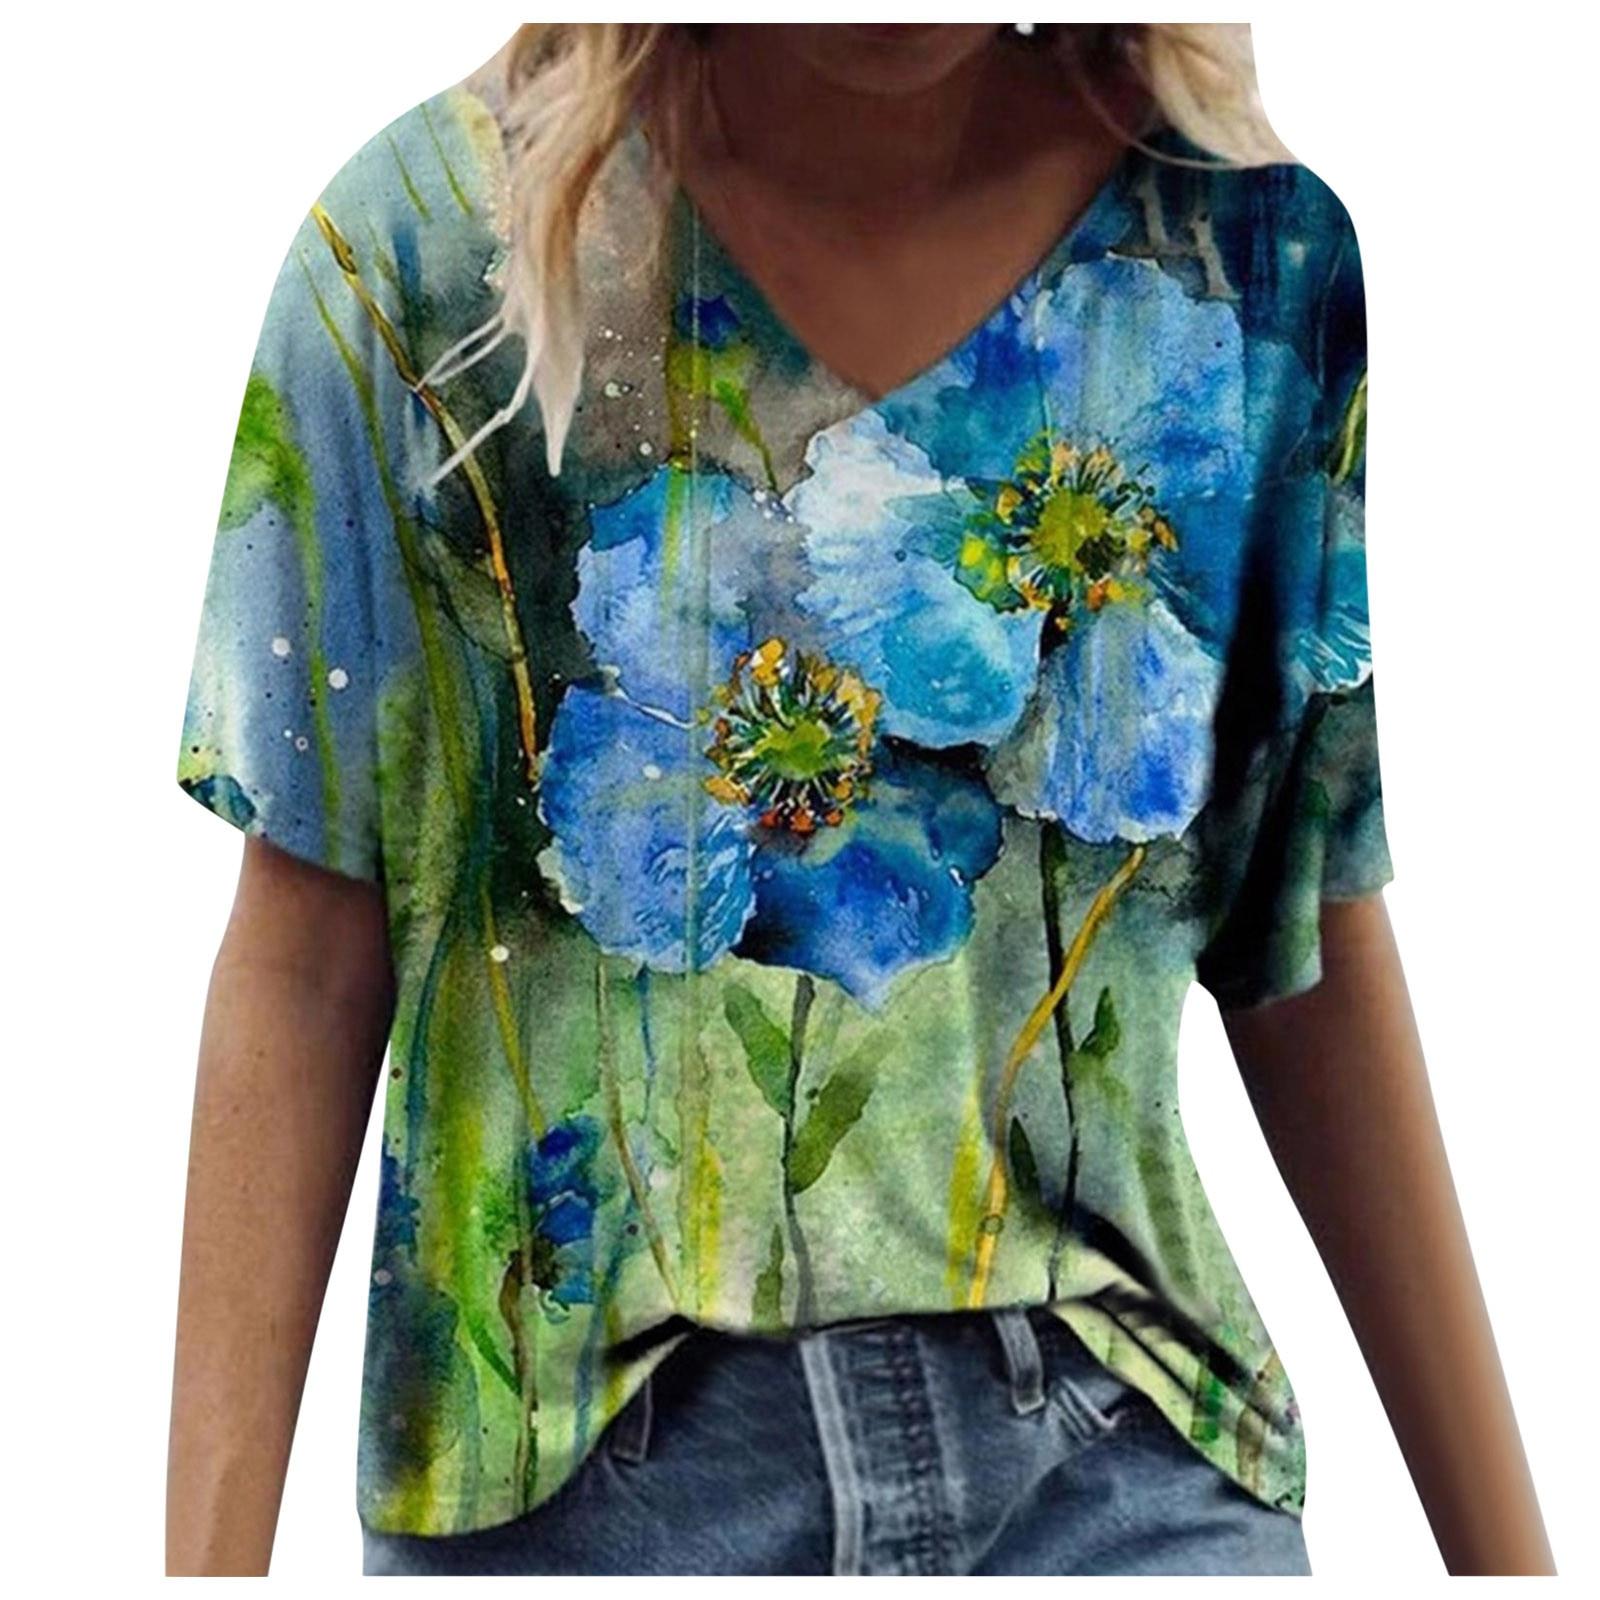 40# Plus Size T-shirt 2021 New Summer Harajuku Top Women Short Sleeve Printed V-neck Tops Tee Casual T-shirt Футболки Оверсайс